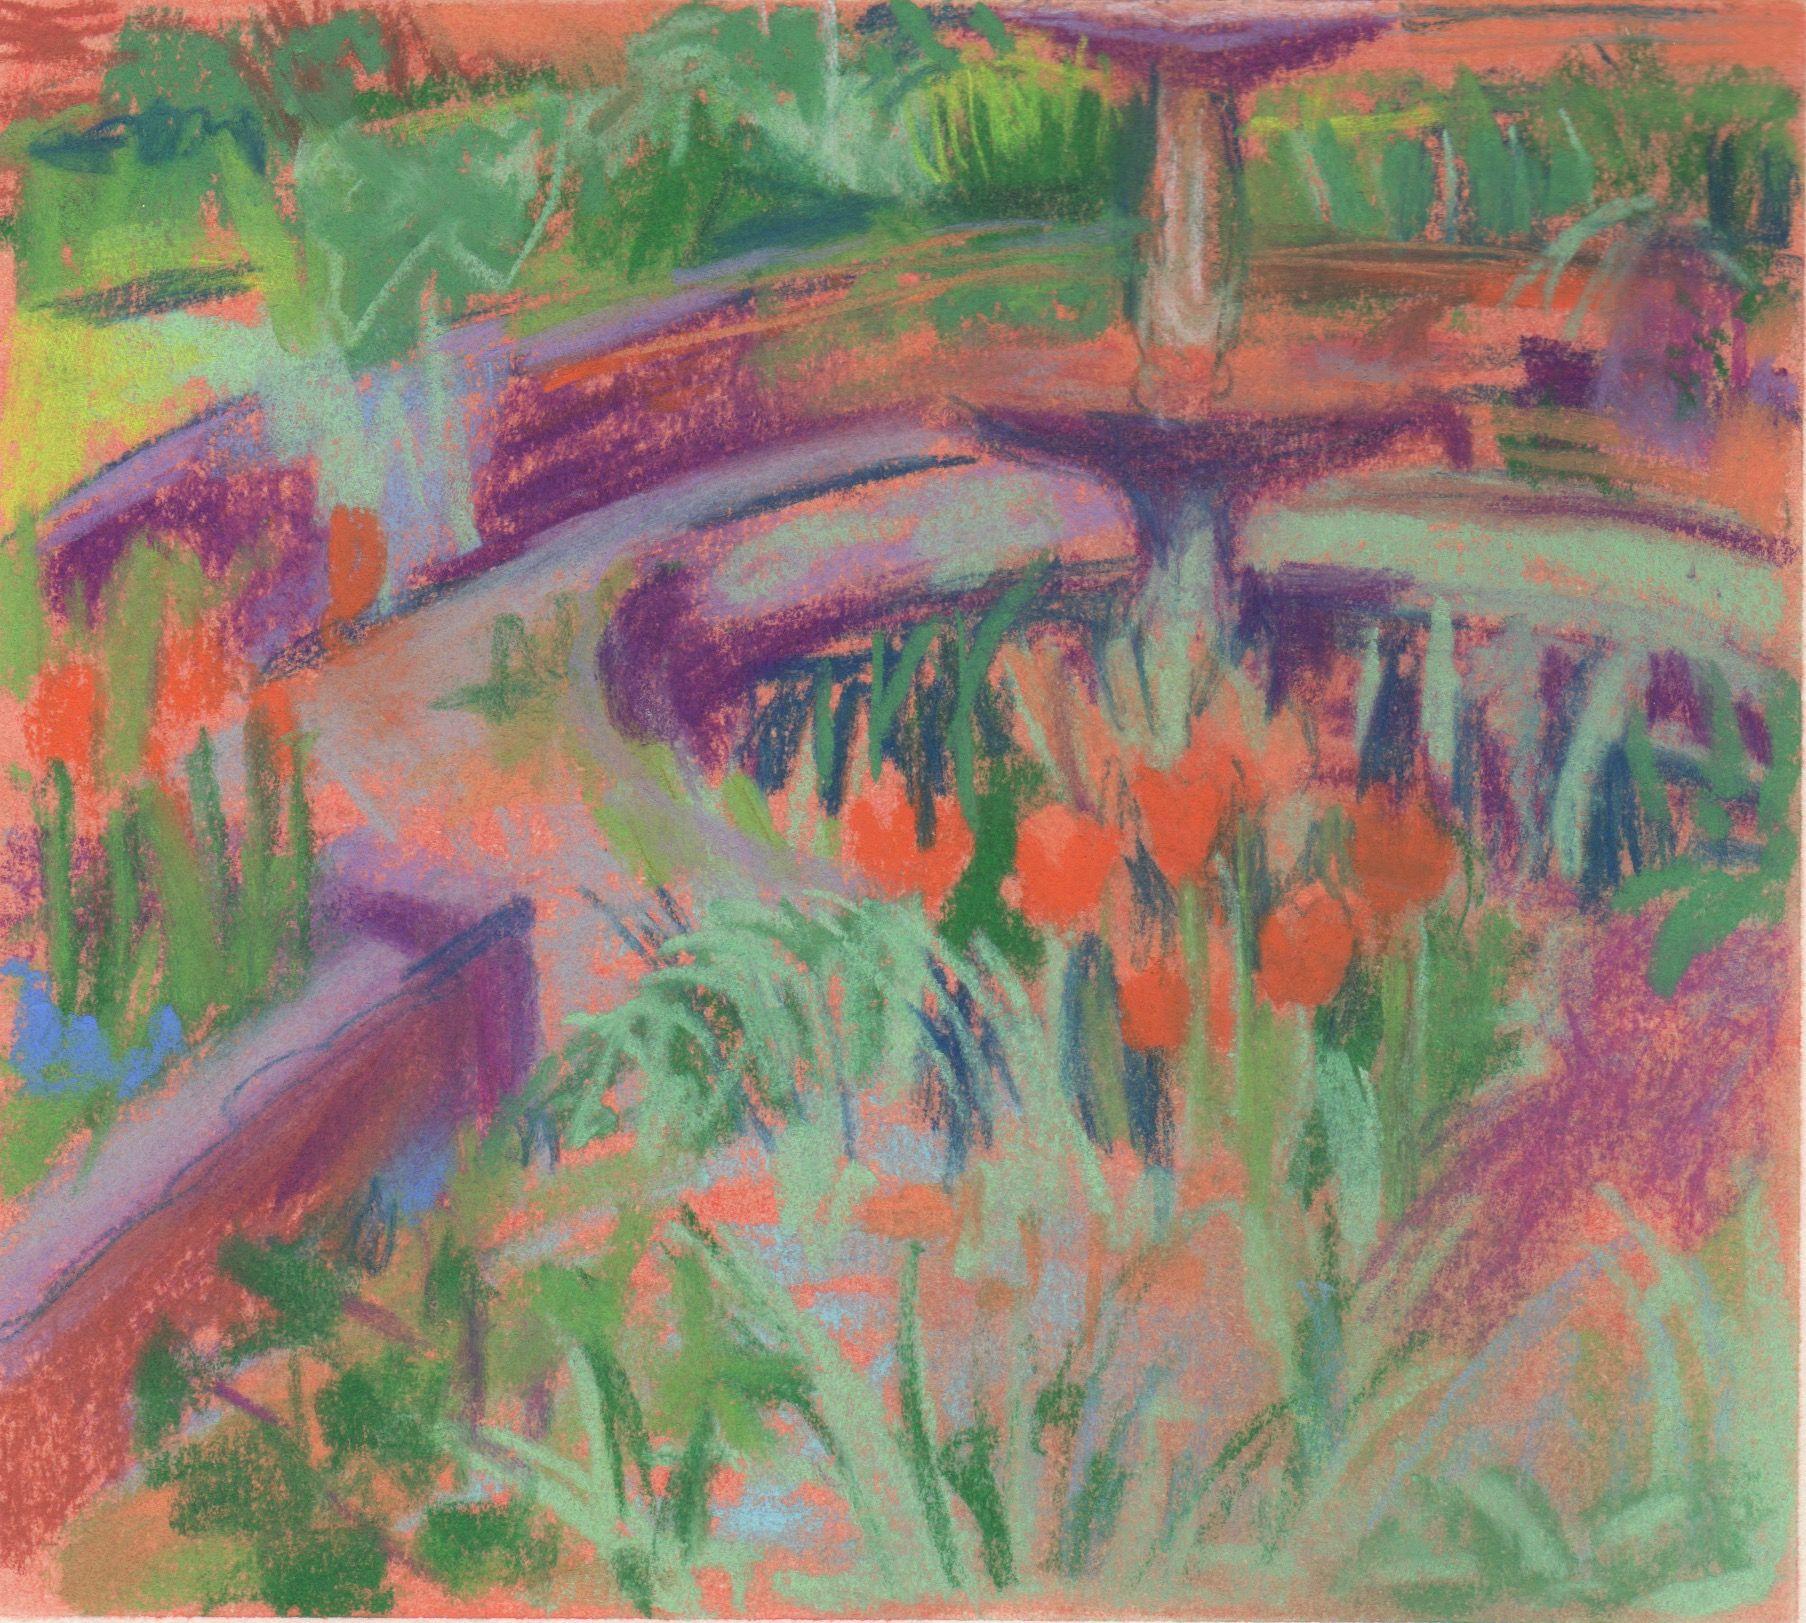 Orange Tulips Old House pastel on paper  June 2015 6 x 6, Rebecca Moss Guyver